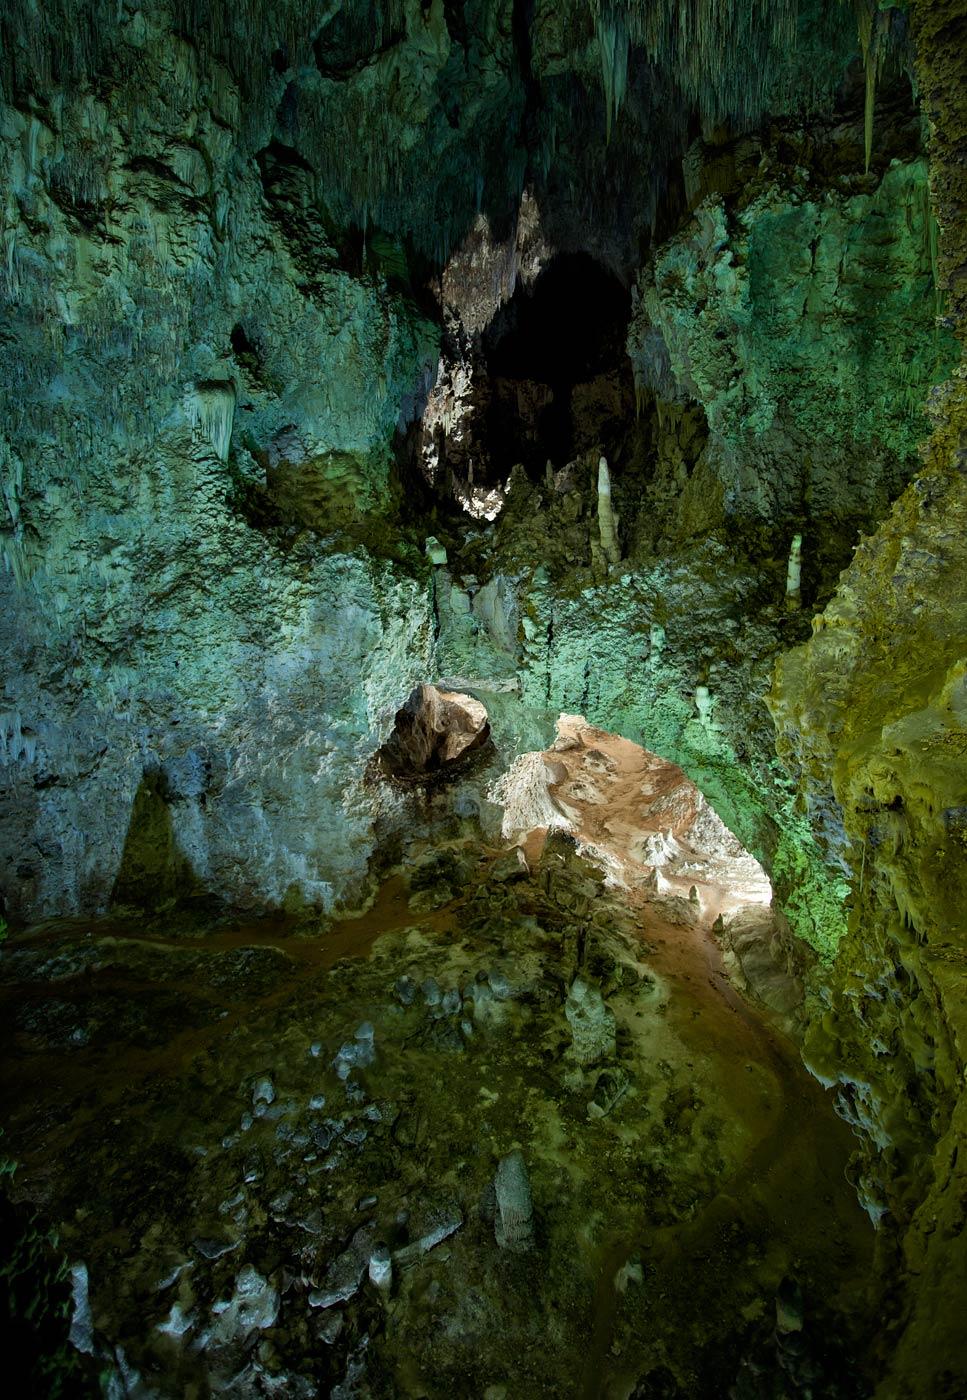 Carlsbad-Caverns-National-Park-ABP-Lower-Cave.jpg